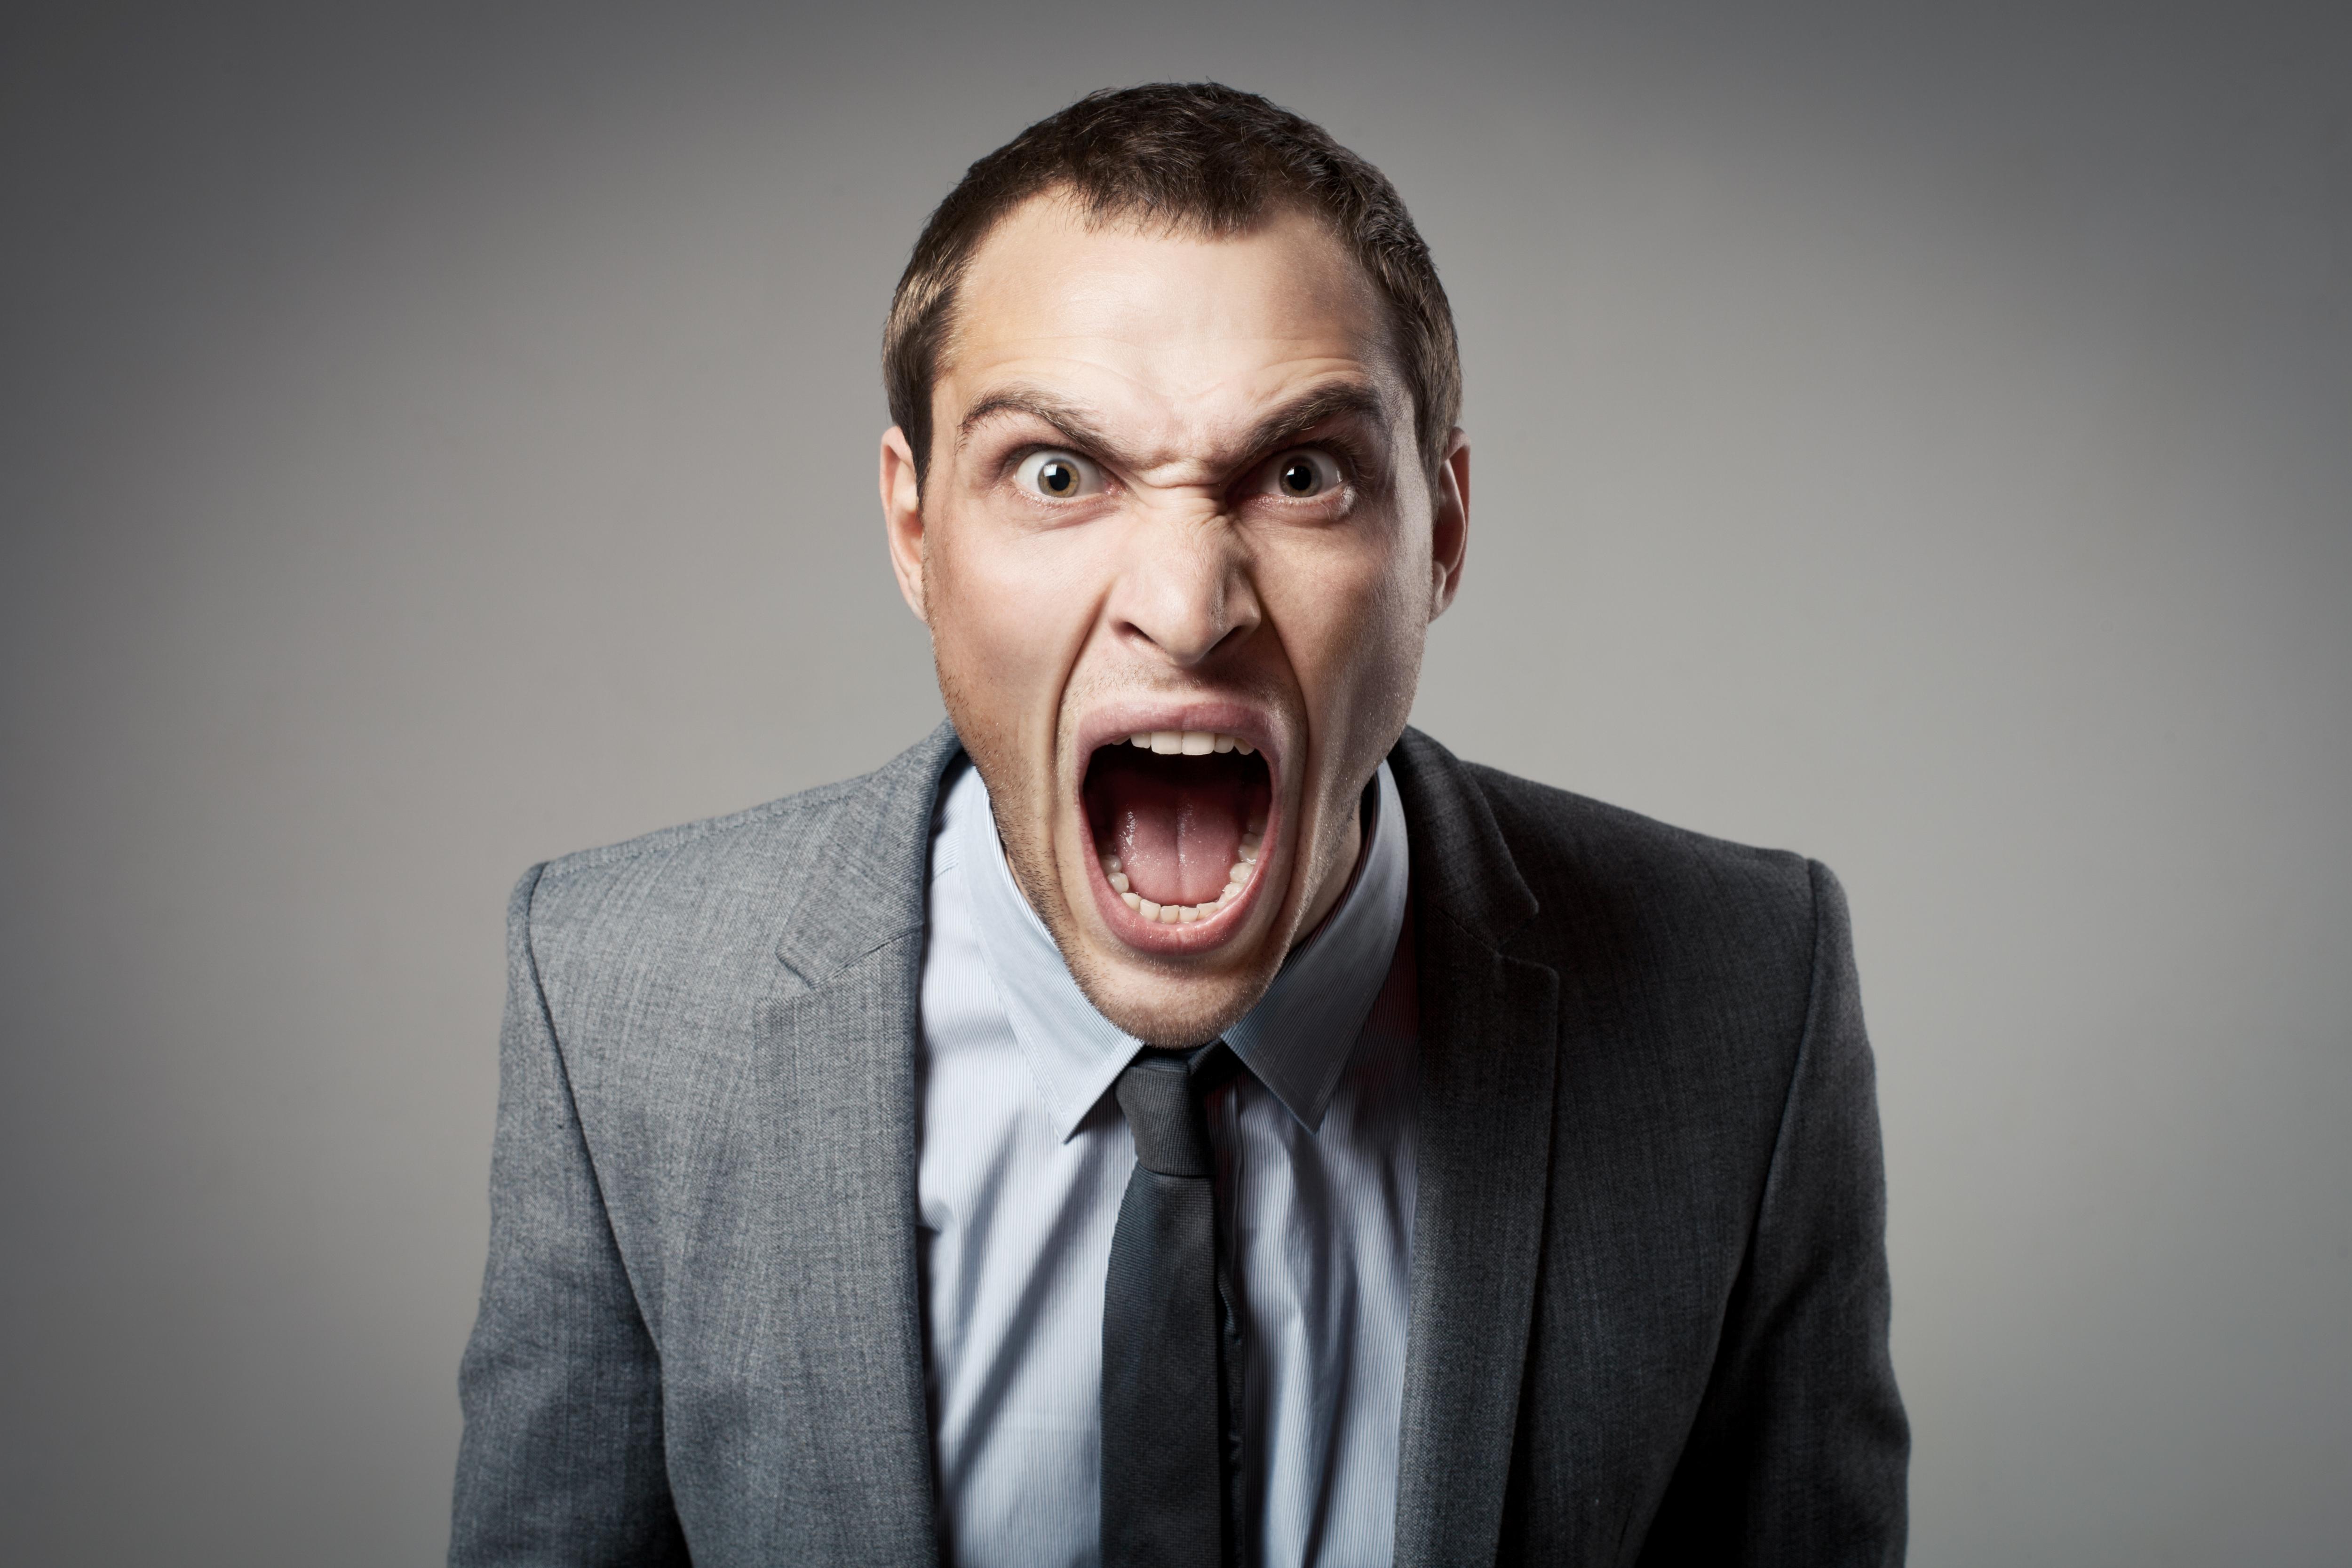 Do emotion and business communication mix?